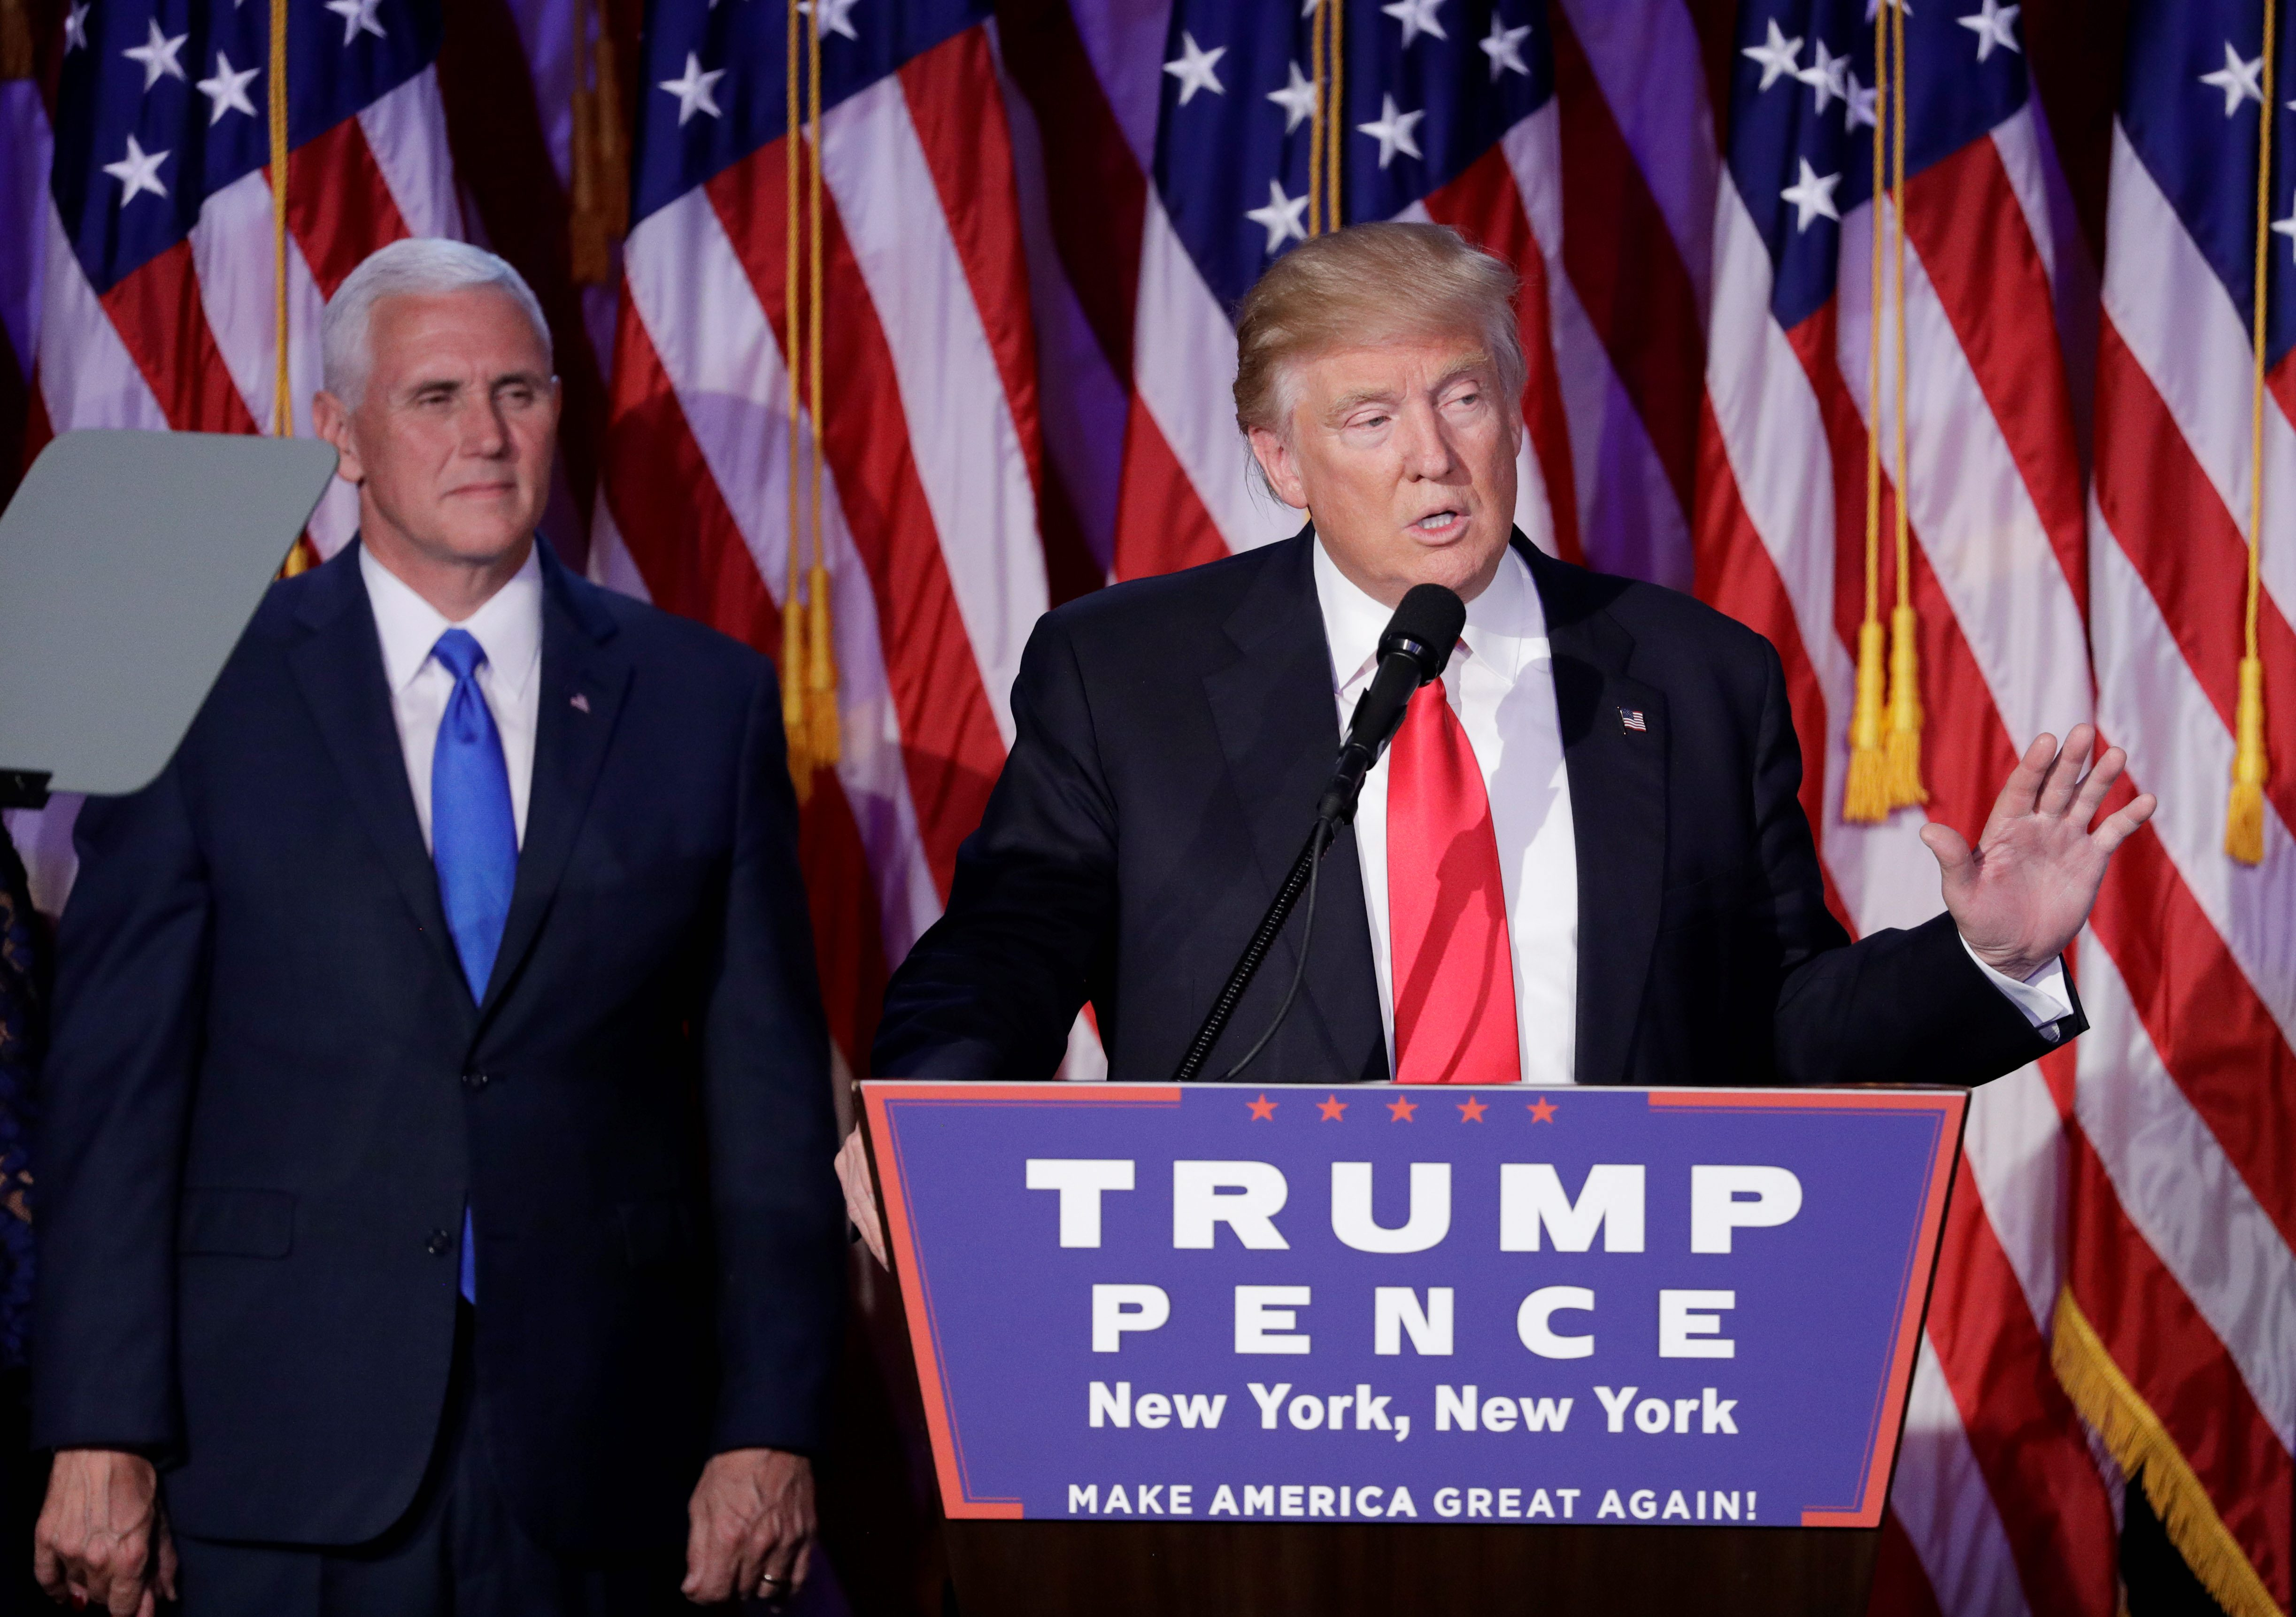 Inside the Beltway: Moody Analytics: Trump wins in 2020